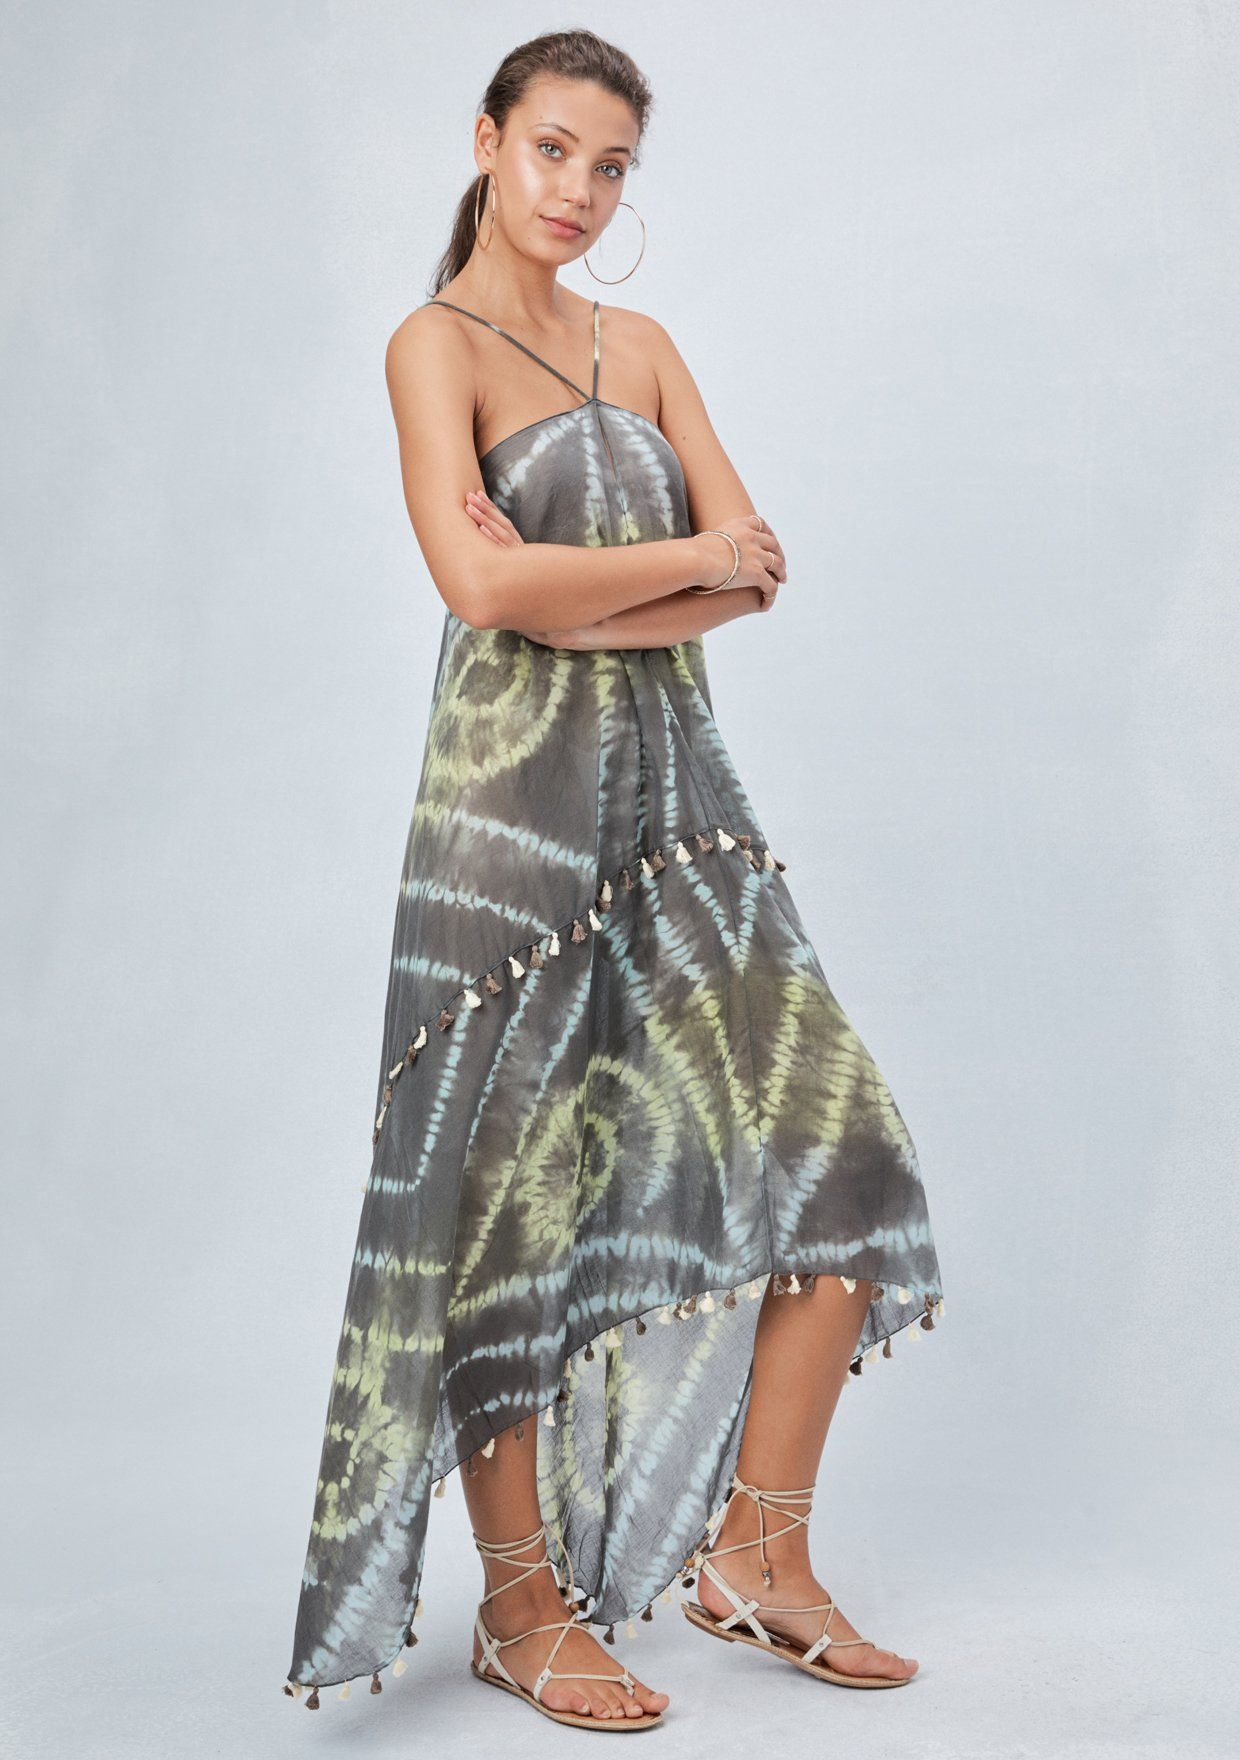 Ania beach dress sheer dress dresses scarf dress